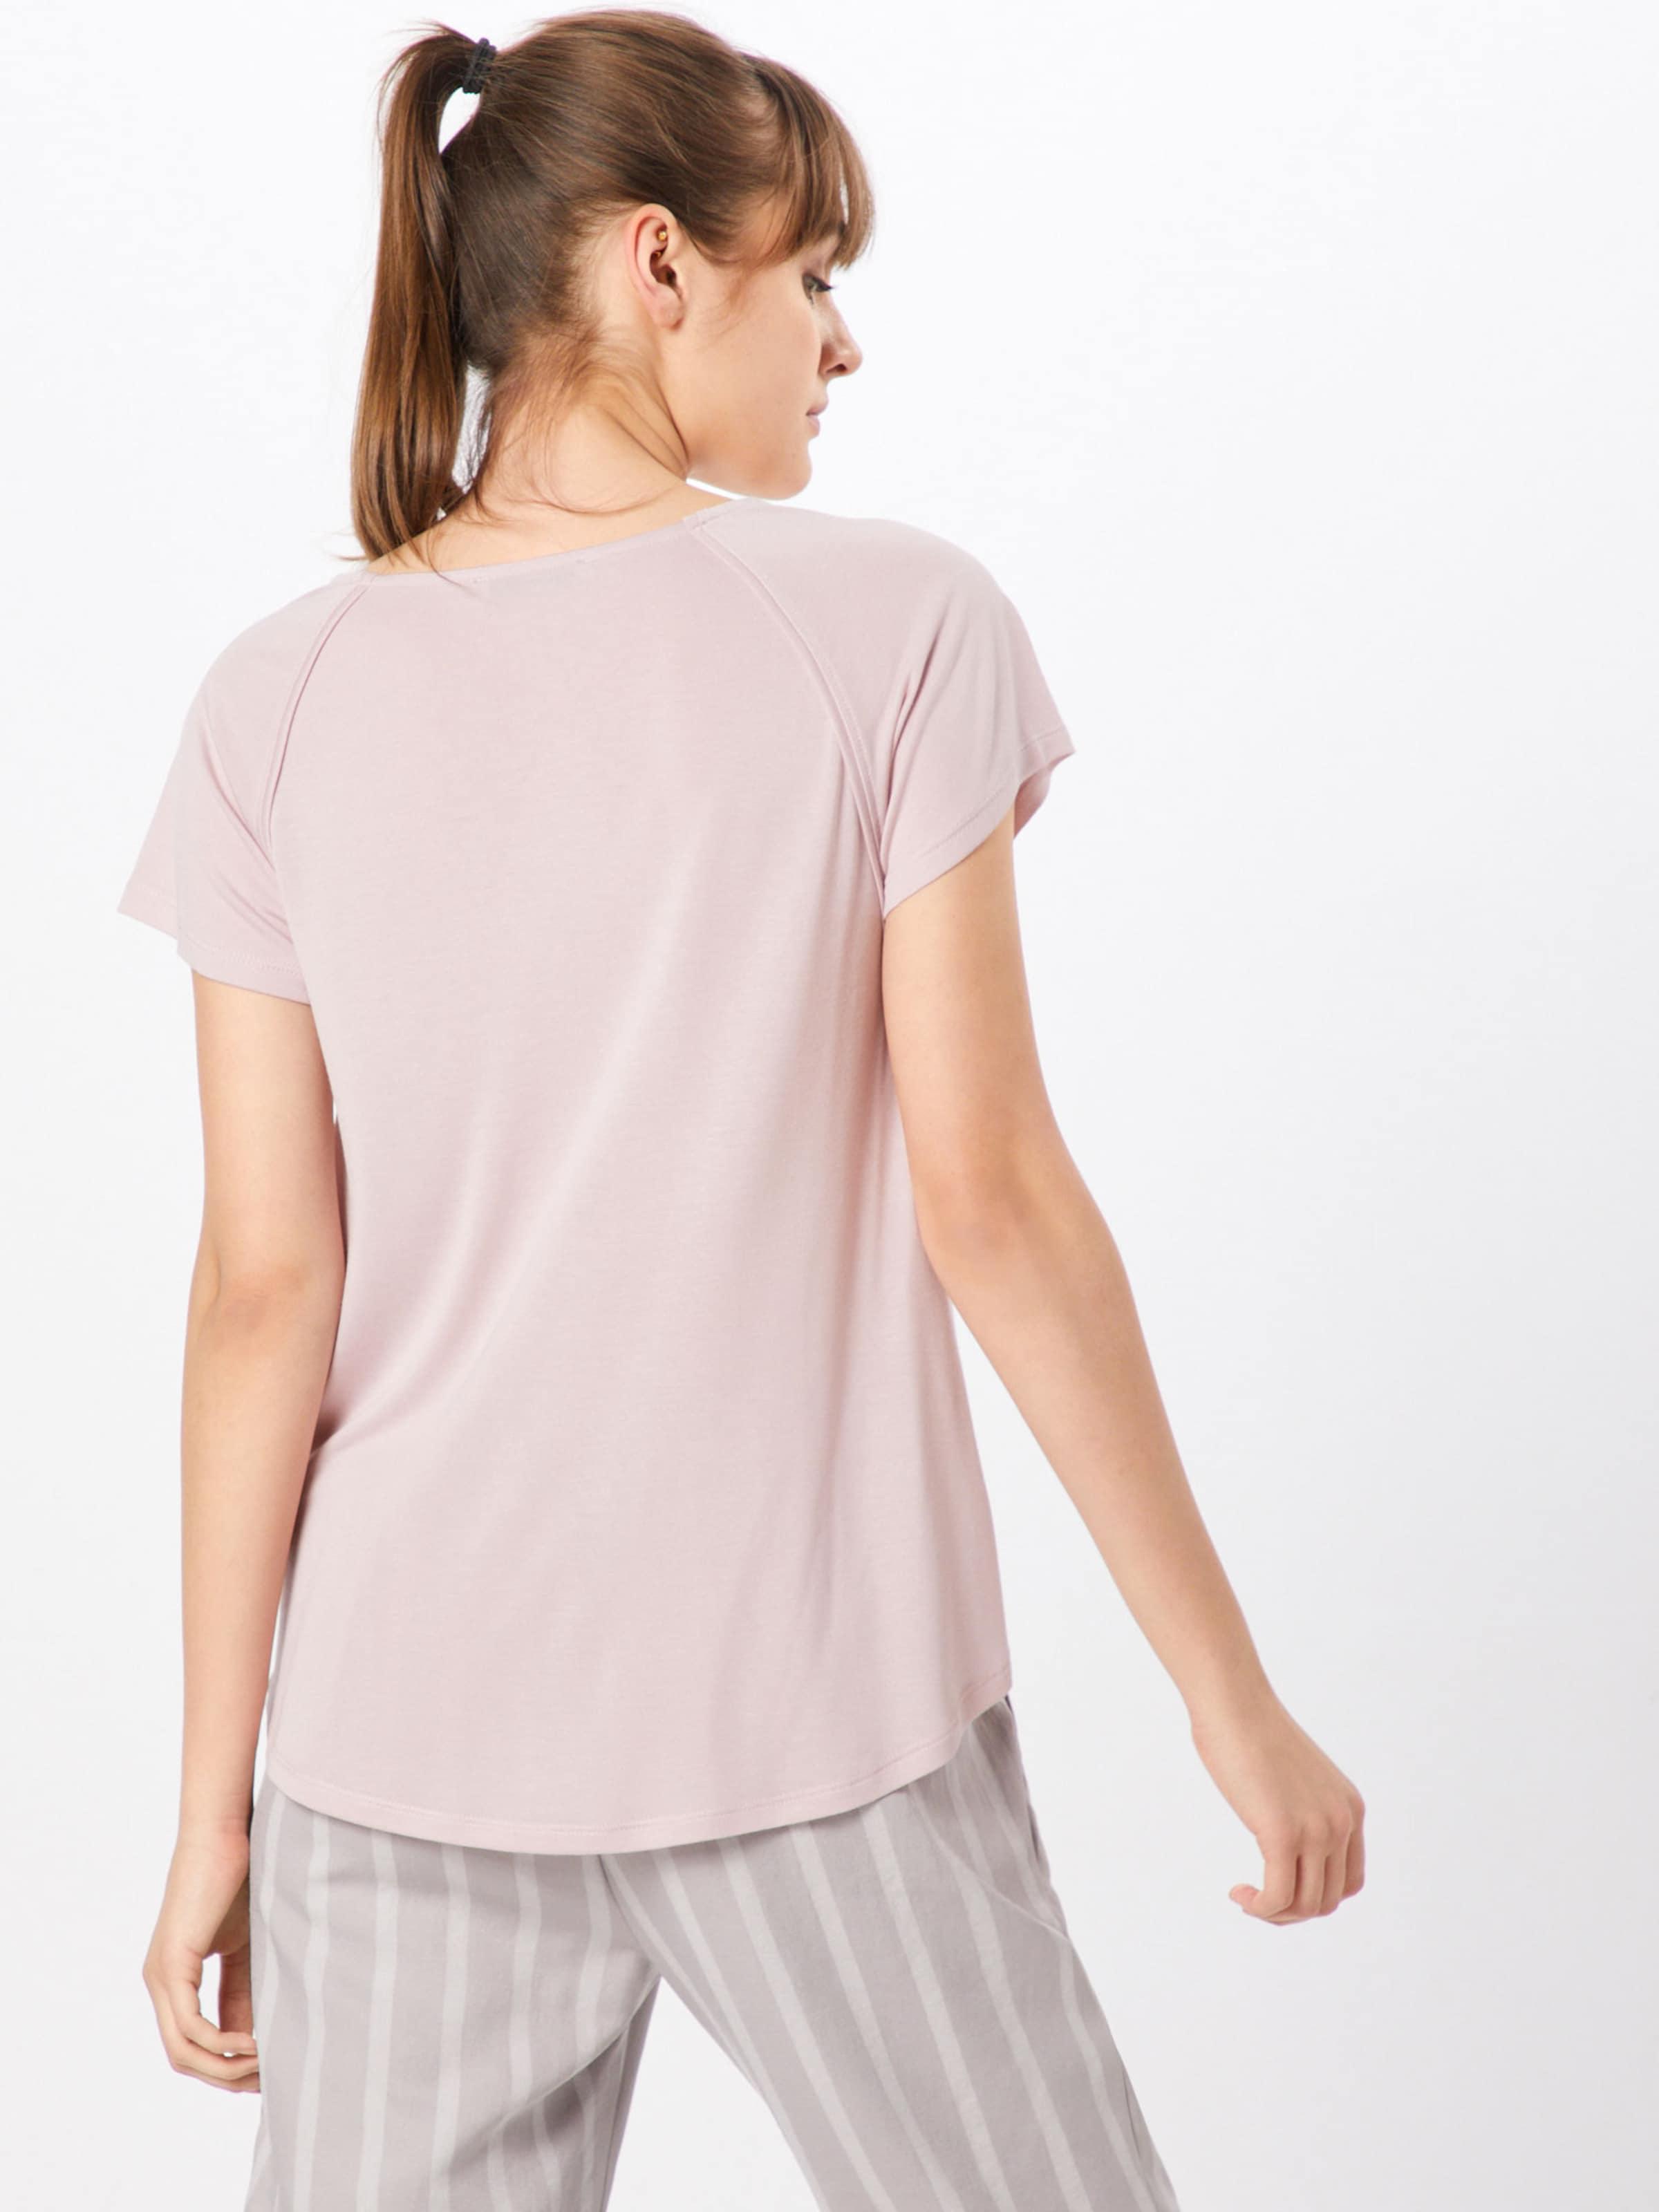 'ss Kiana' Hailys Tp T shirt In Rosé M ynN0m8OPvw